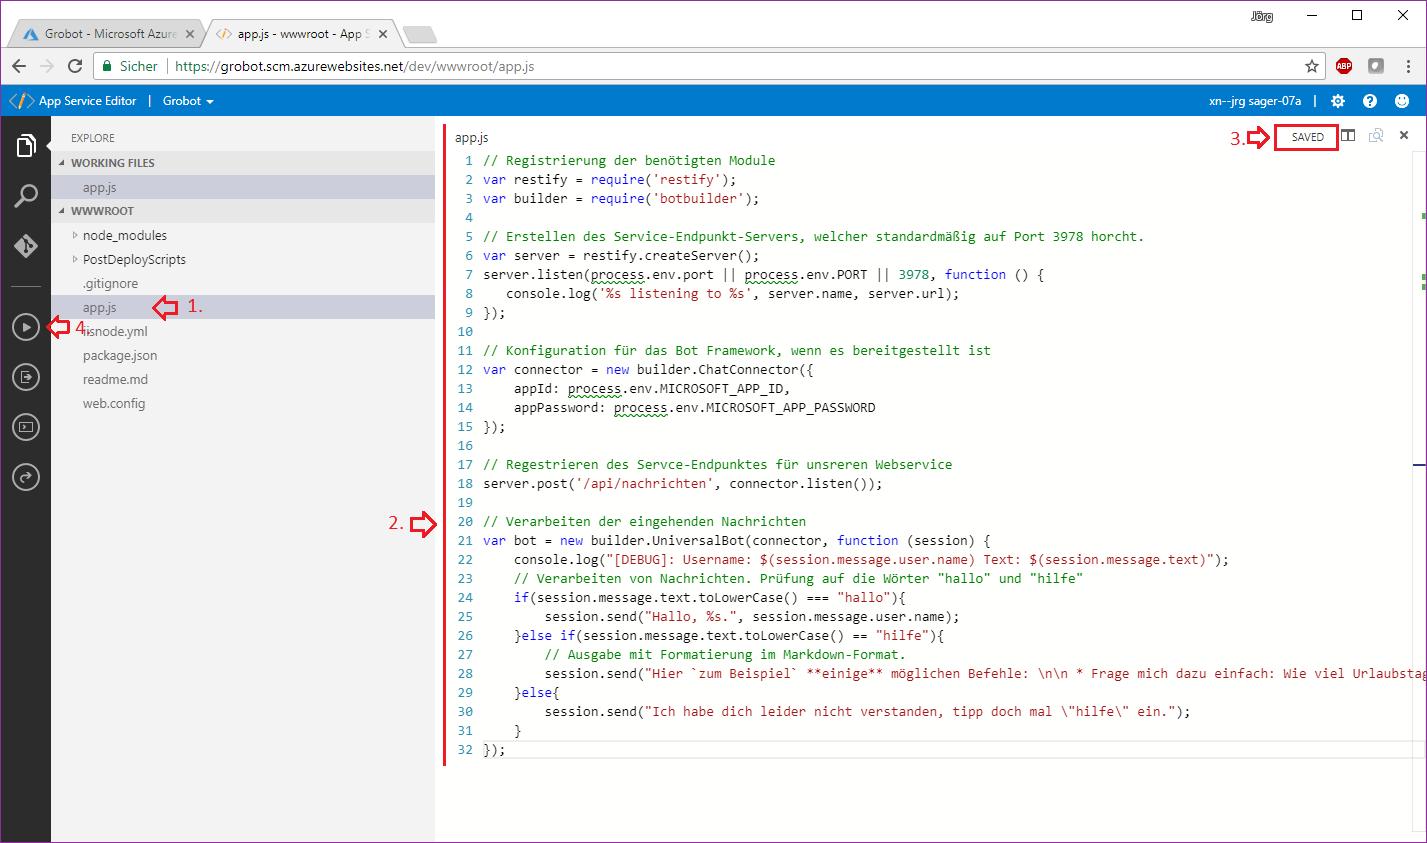 Azure Code Editor